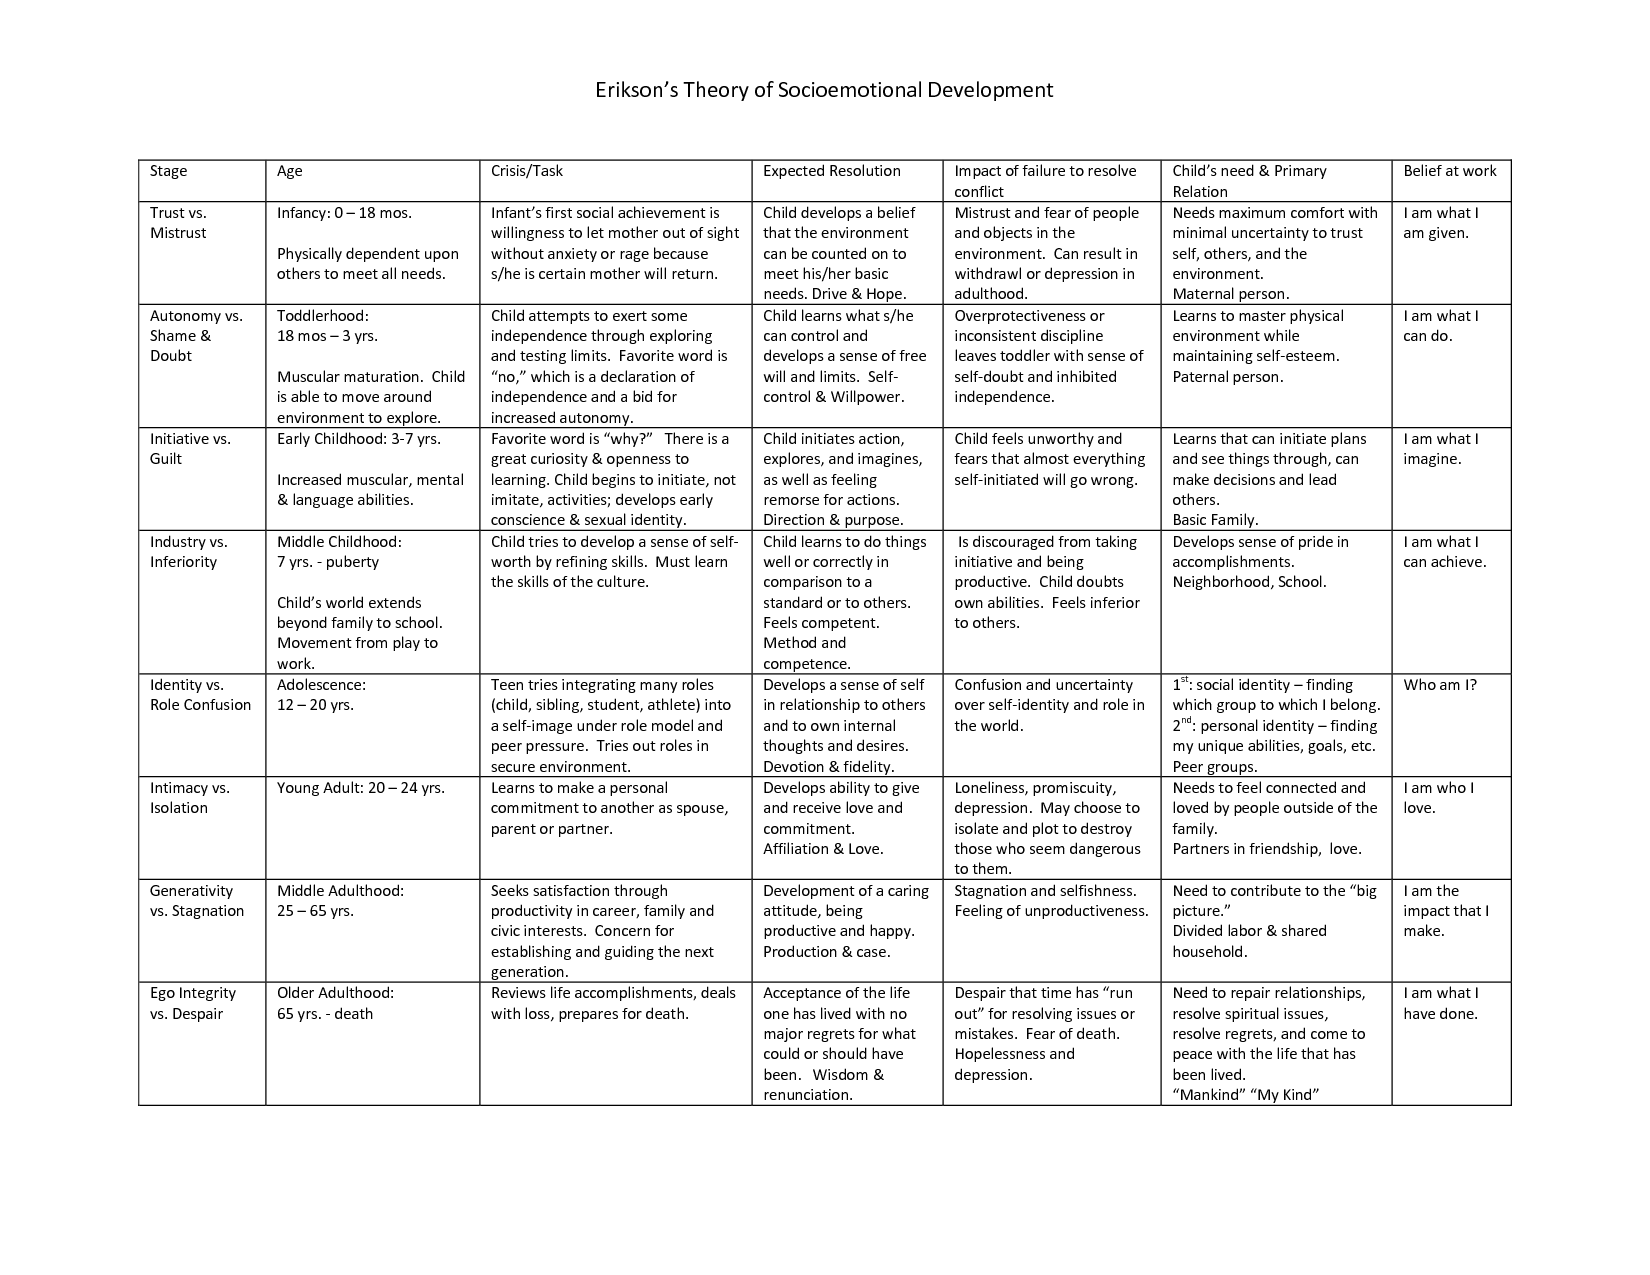 Developmental Tasks And Psychosocial Crisis Chart